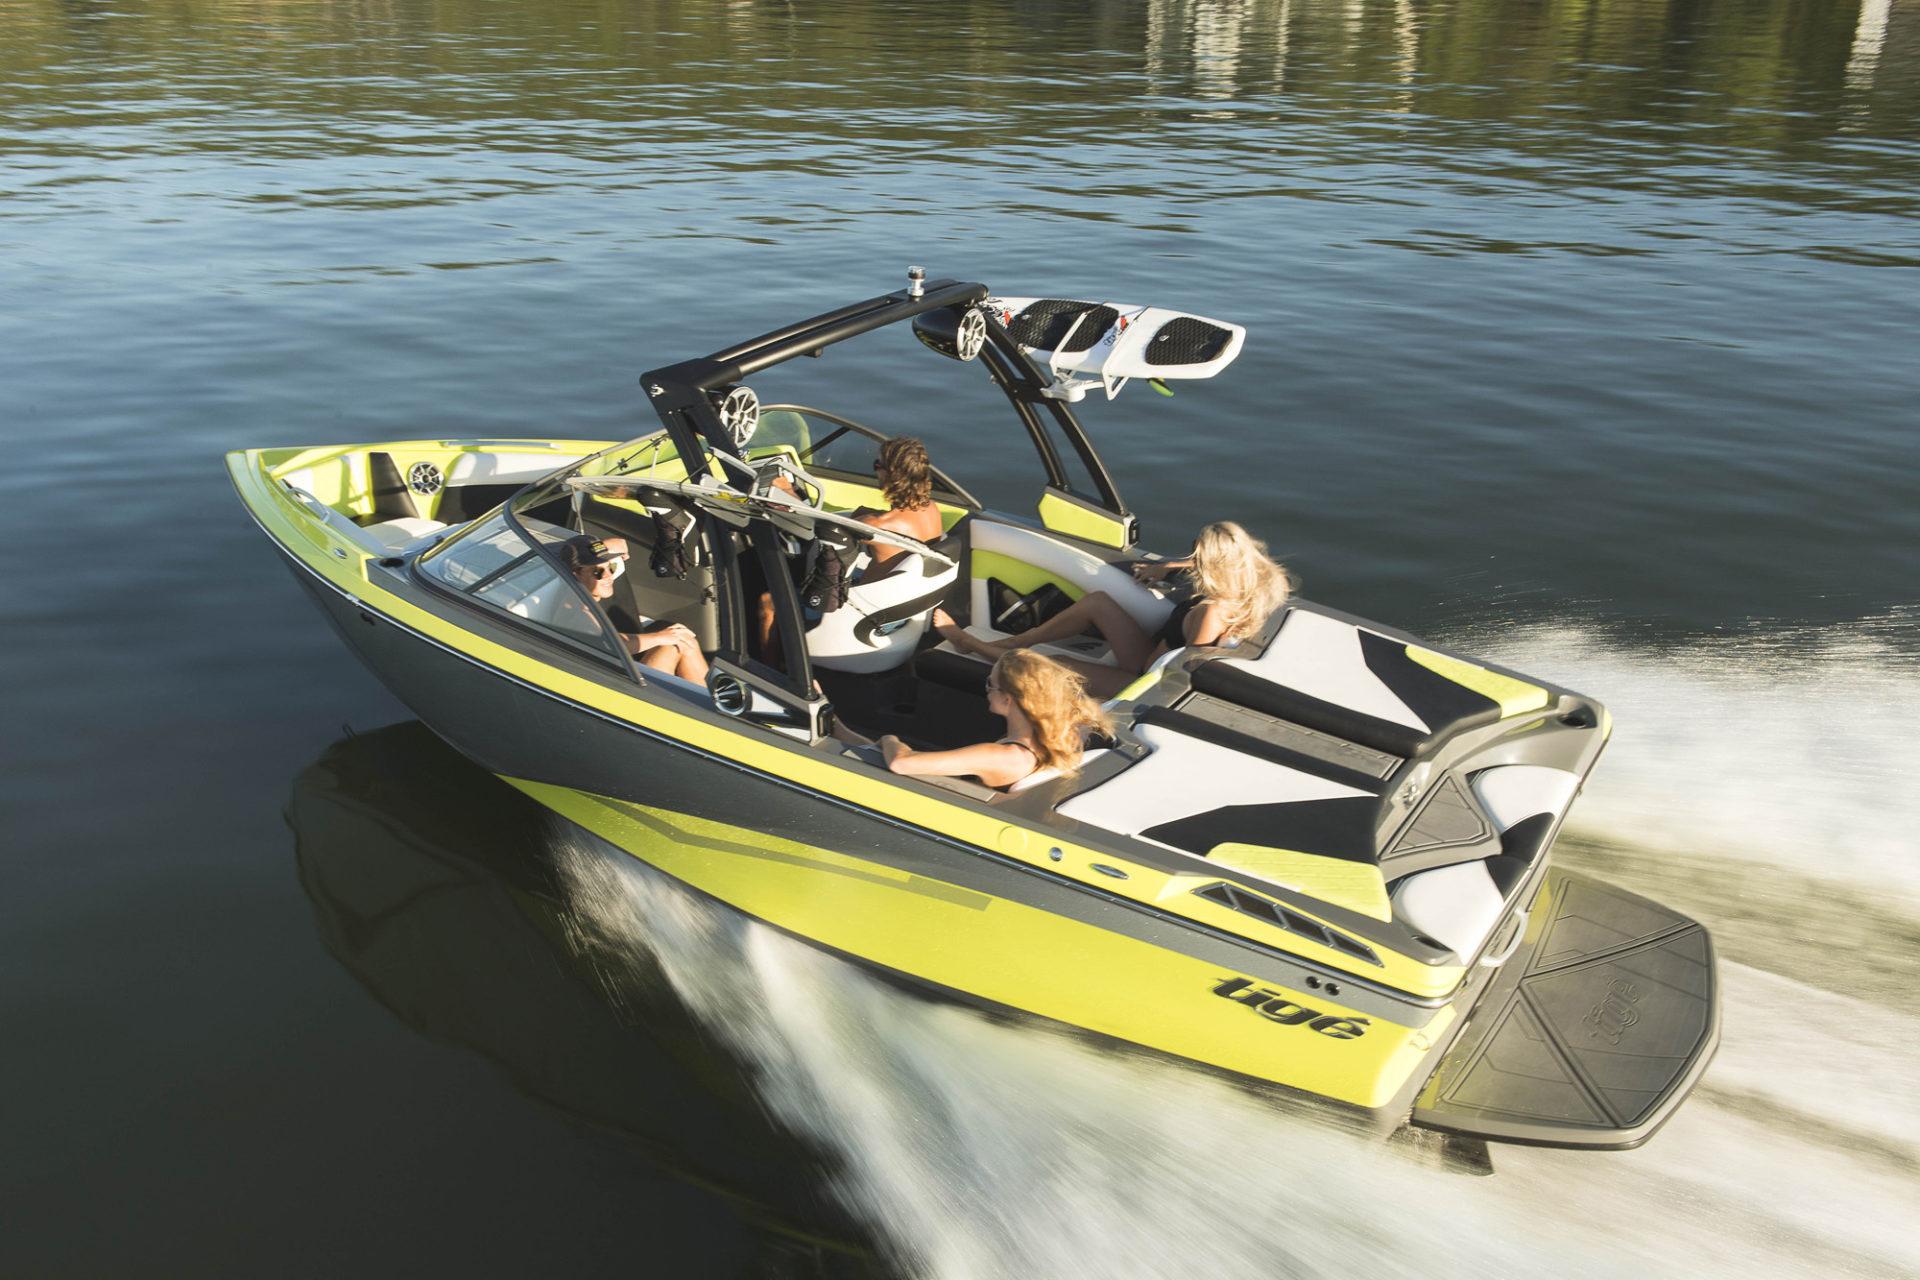 BOAT 11  2019 TIGE R21  PLATINUM LEVEL  Lakeway Boat Club